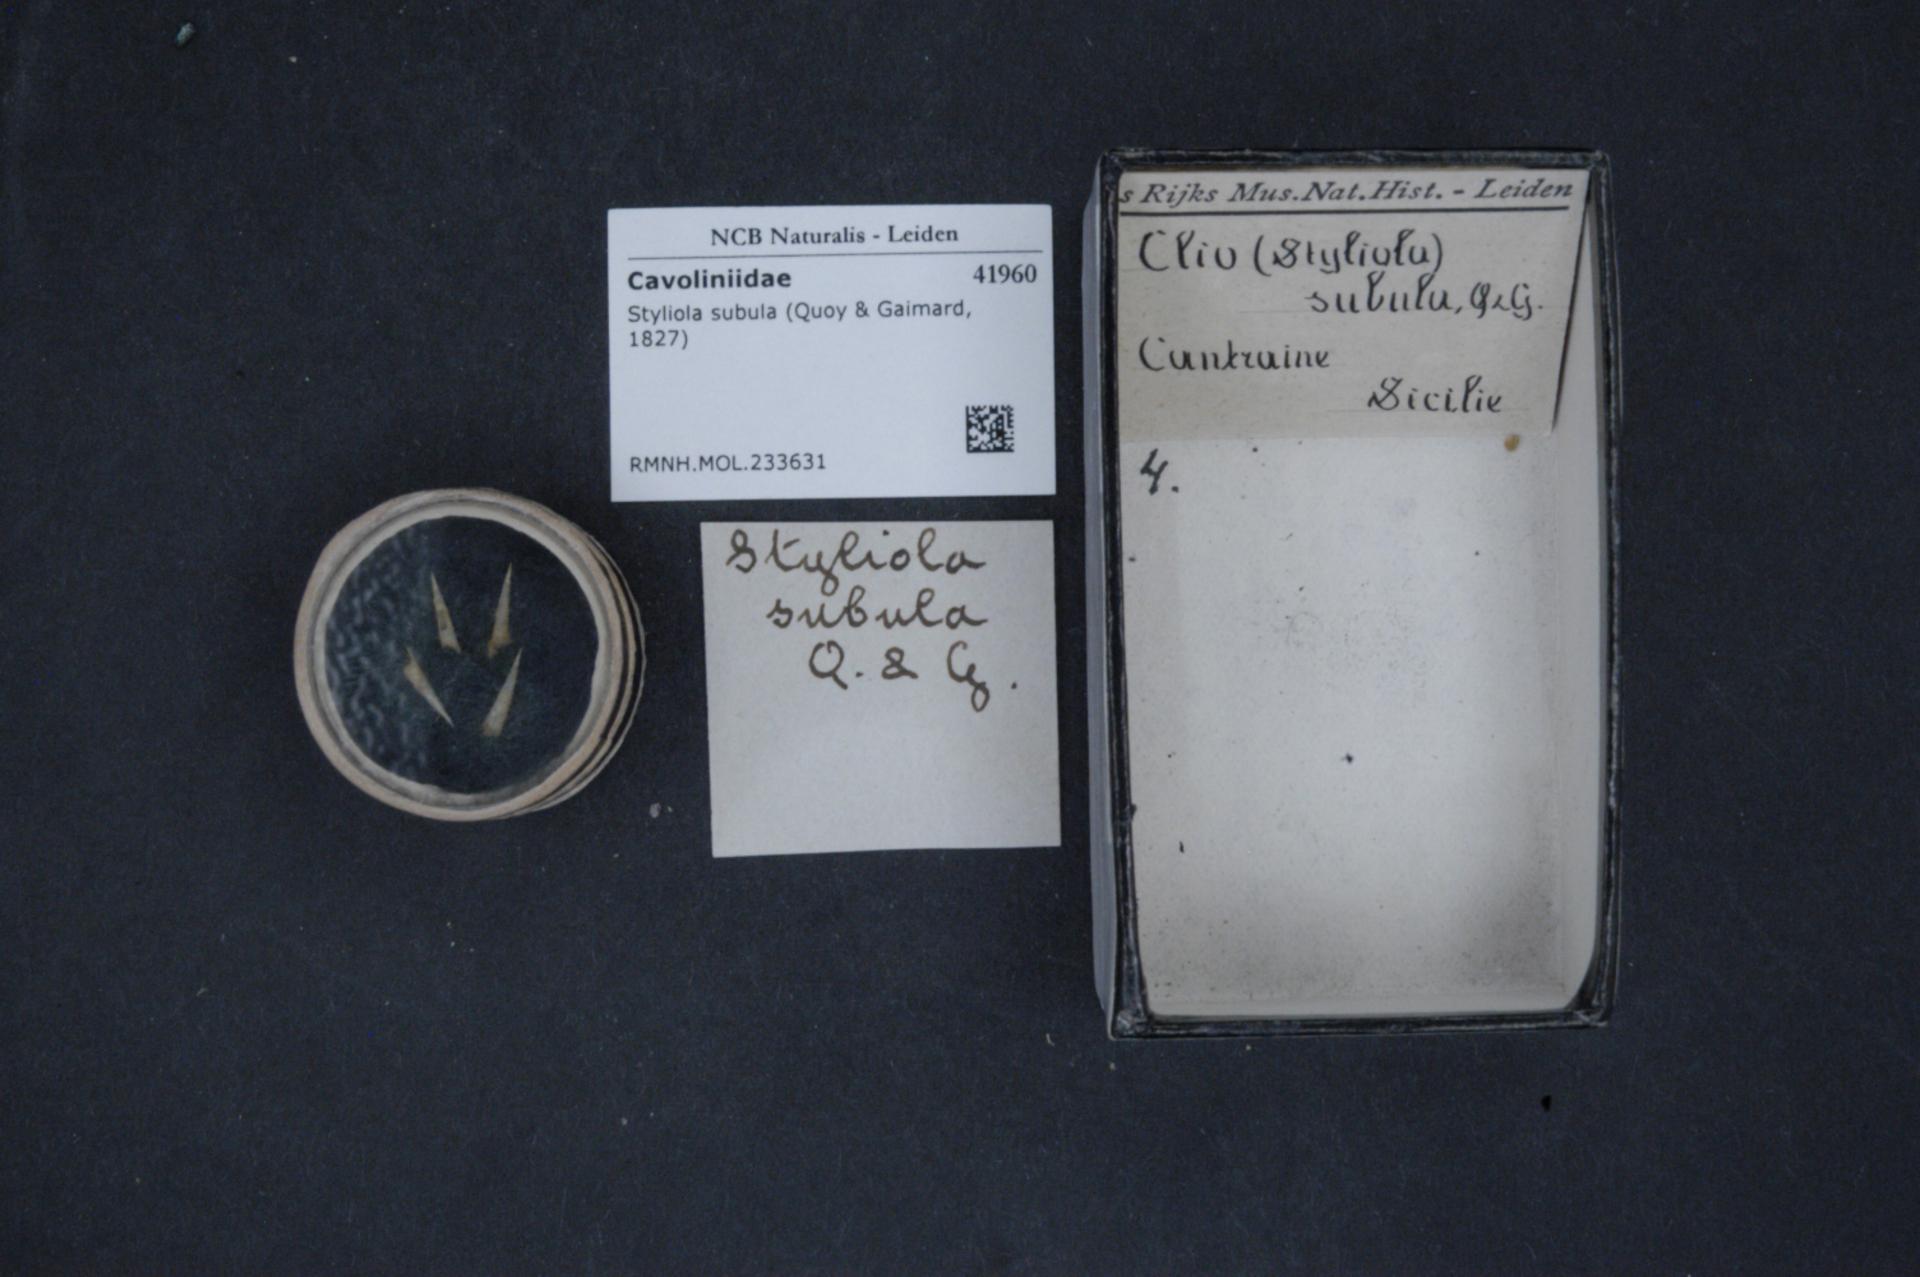 RMNH.MOL.233631 | Styliola subula (Quoy & Gaimard, 1827)